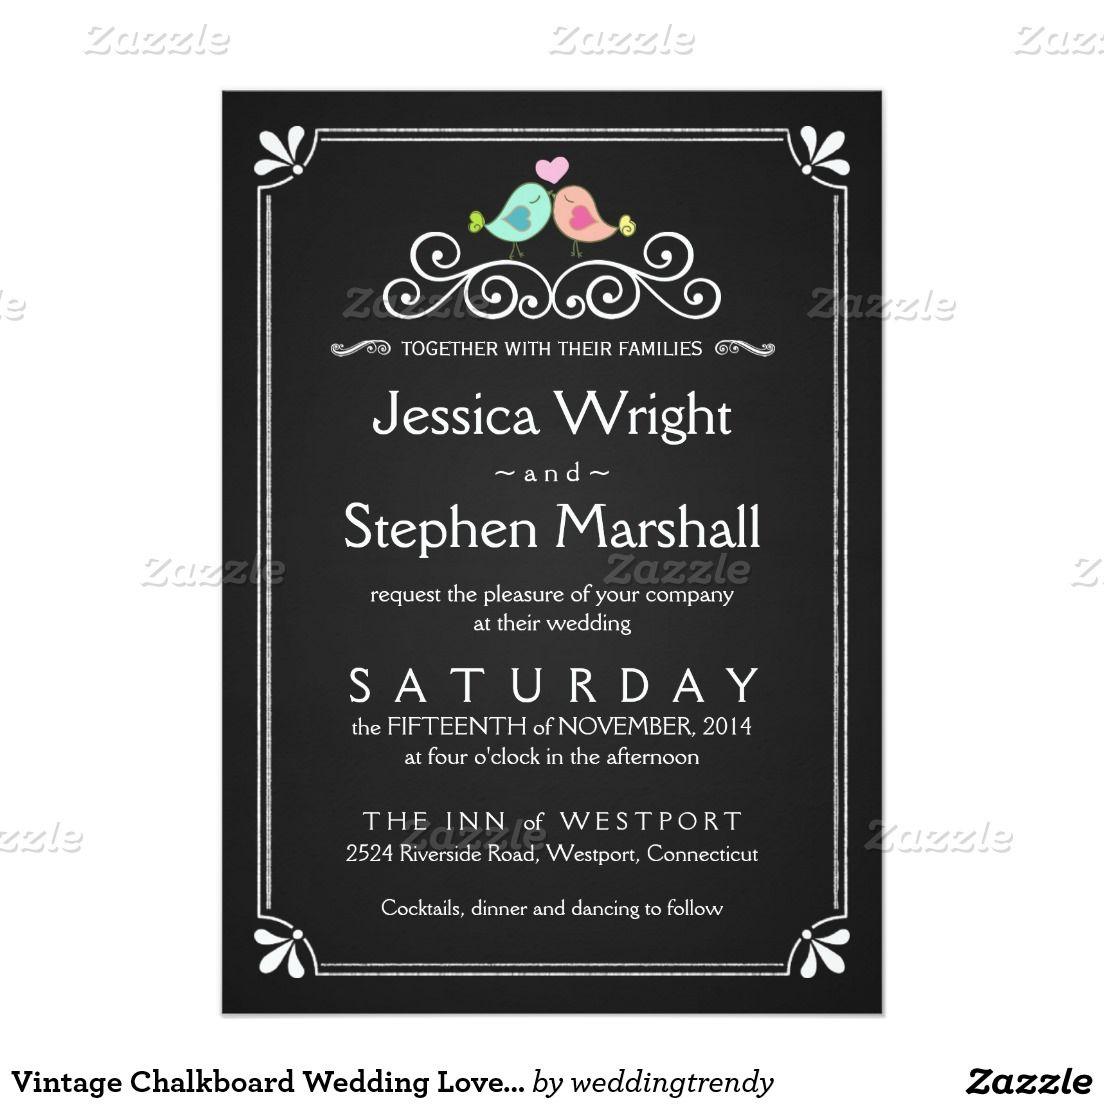 Vintage Chalkboard Wedding Love Birds Invite Zazzle Com Chalkboard Wedding Invitations Letterpress Wedding Invitations Chalkboard Wedding